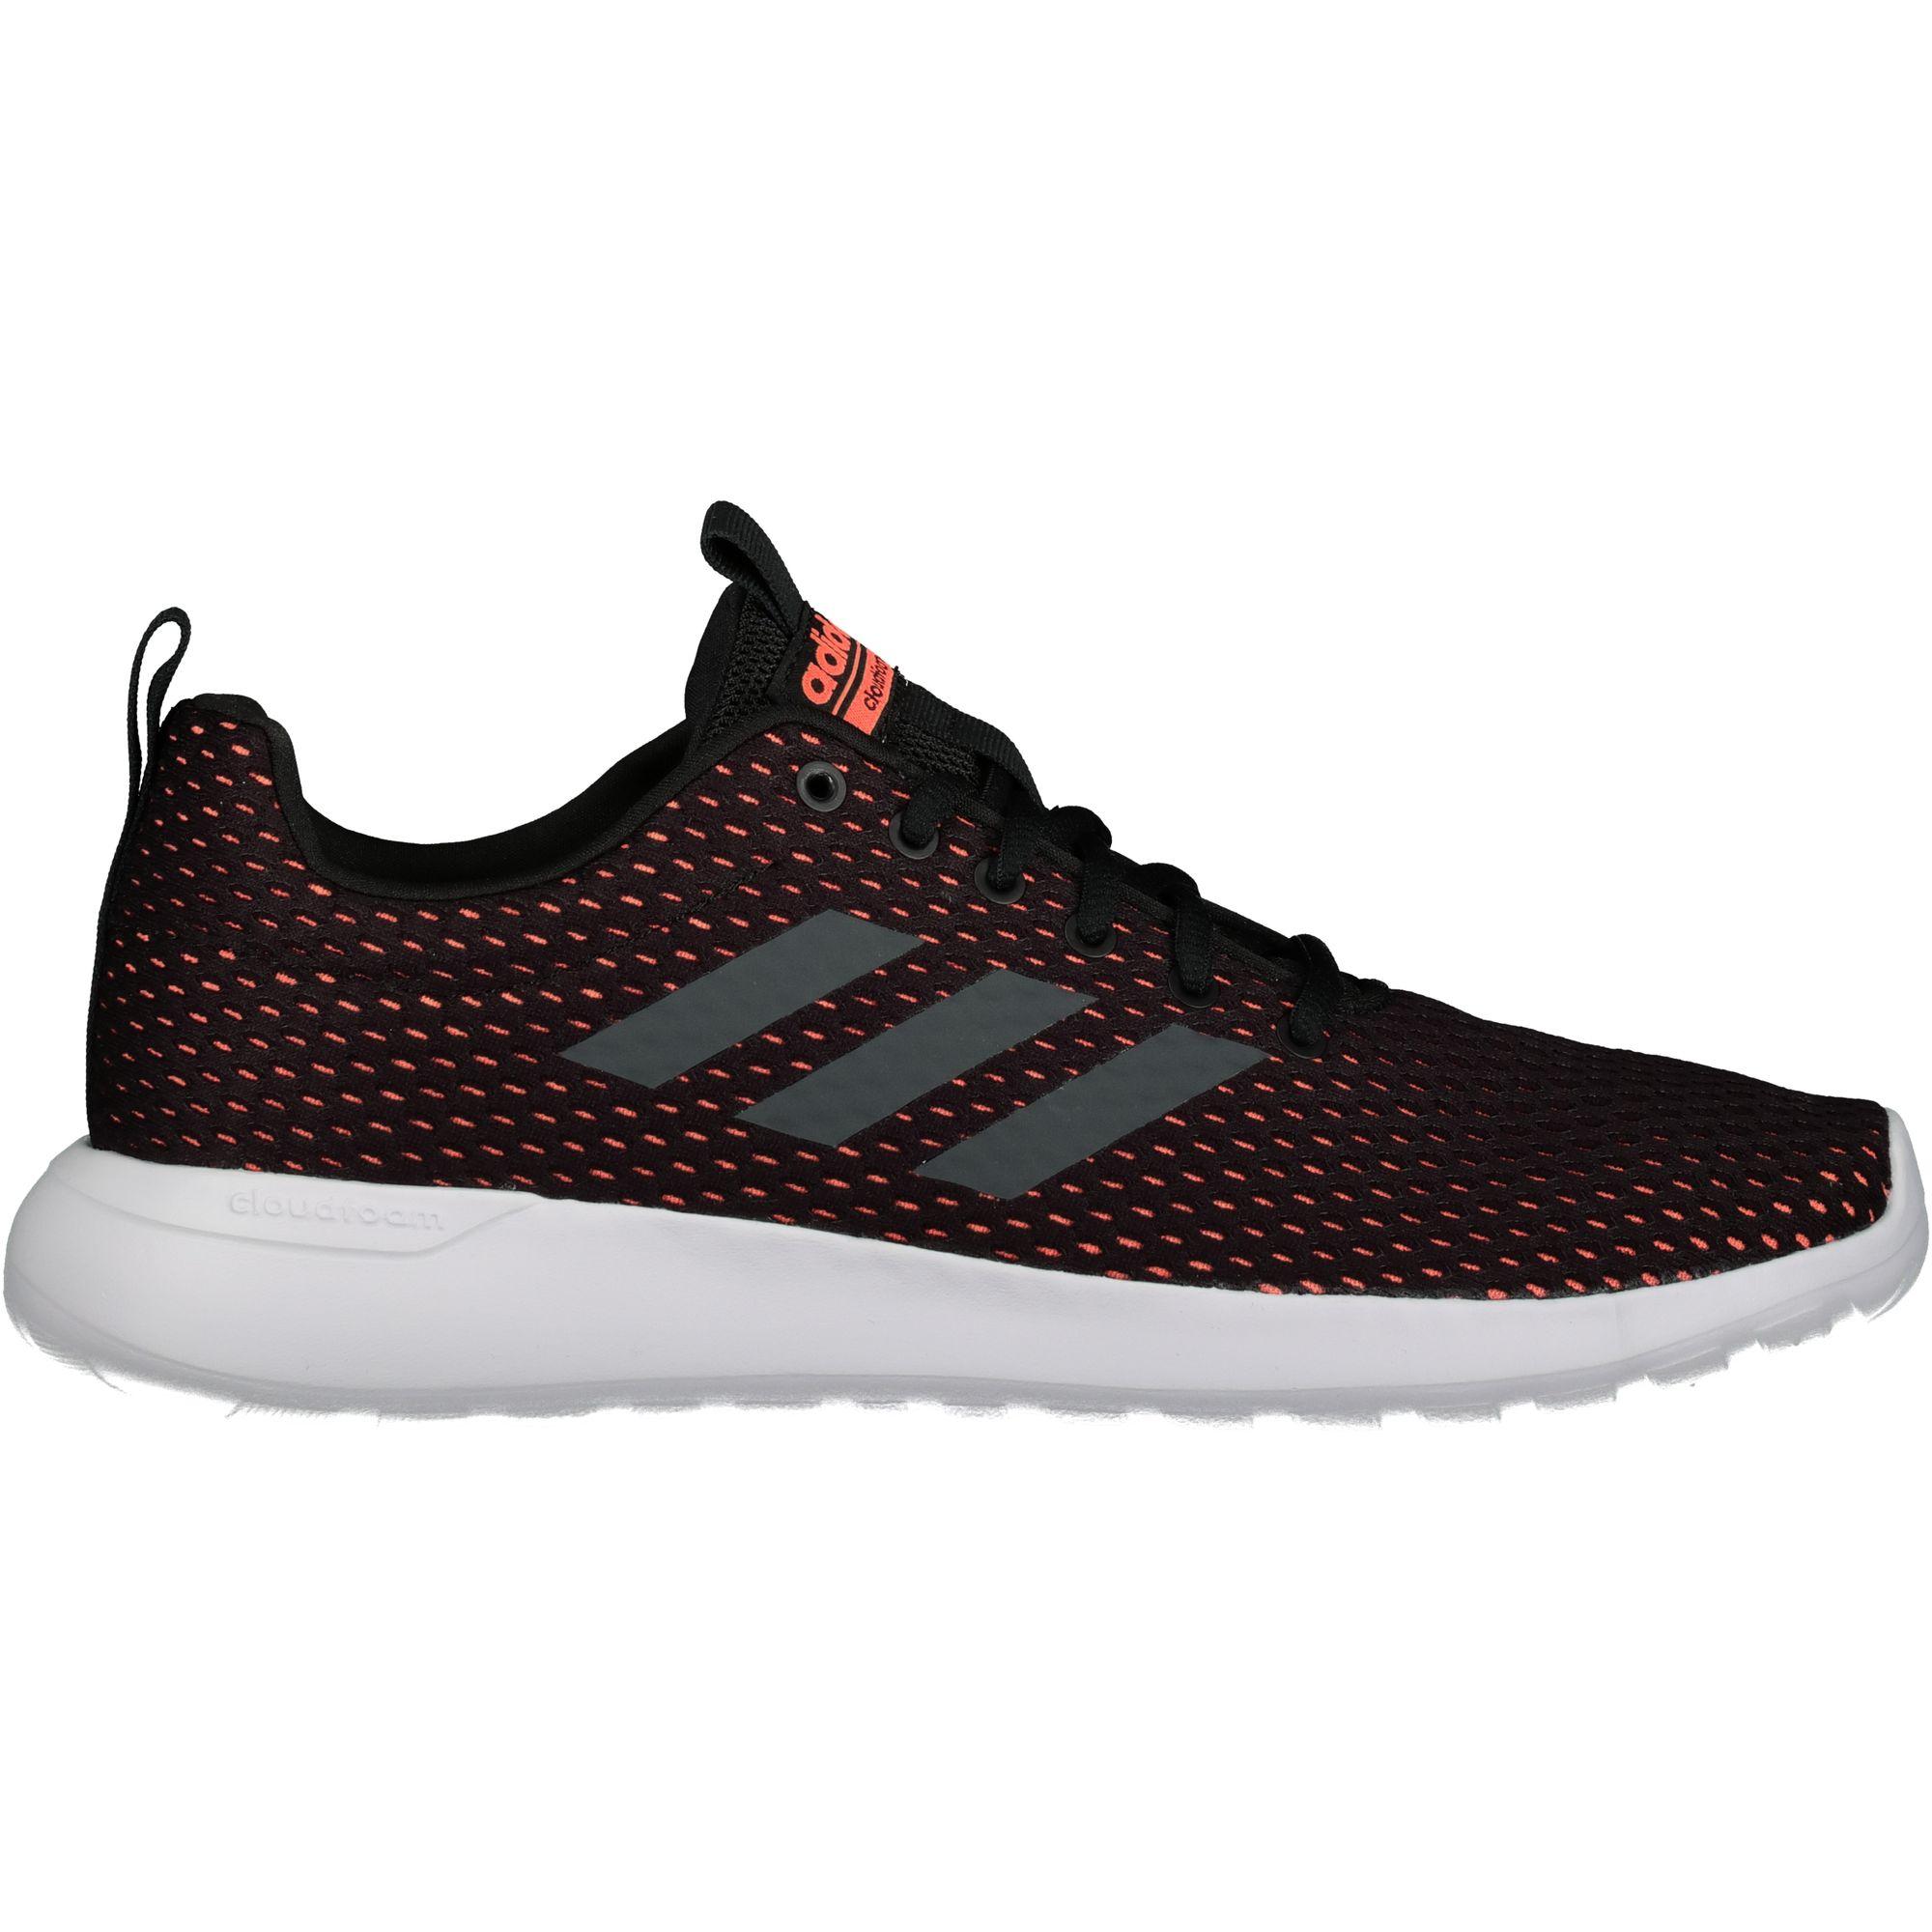 Blackgresixsolred Schuhe Men Racer Adidas Lite Performance Freizeitschuhe Herren Cln 7Ifvgb6Yy